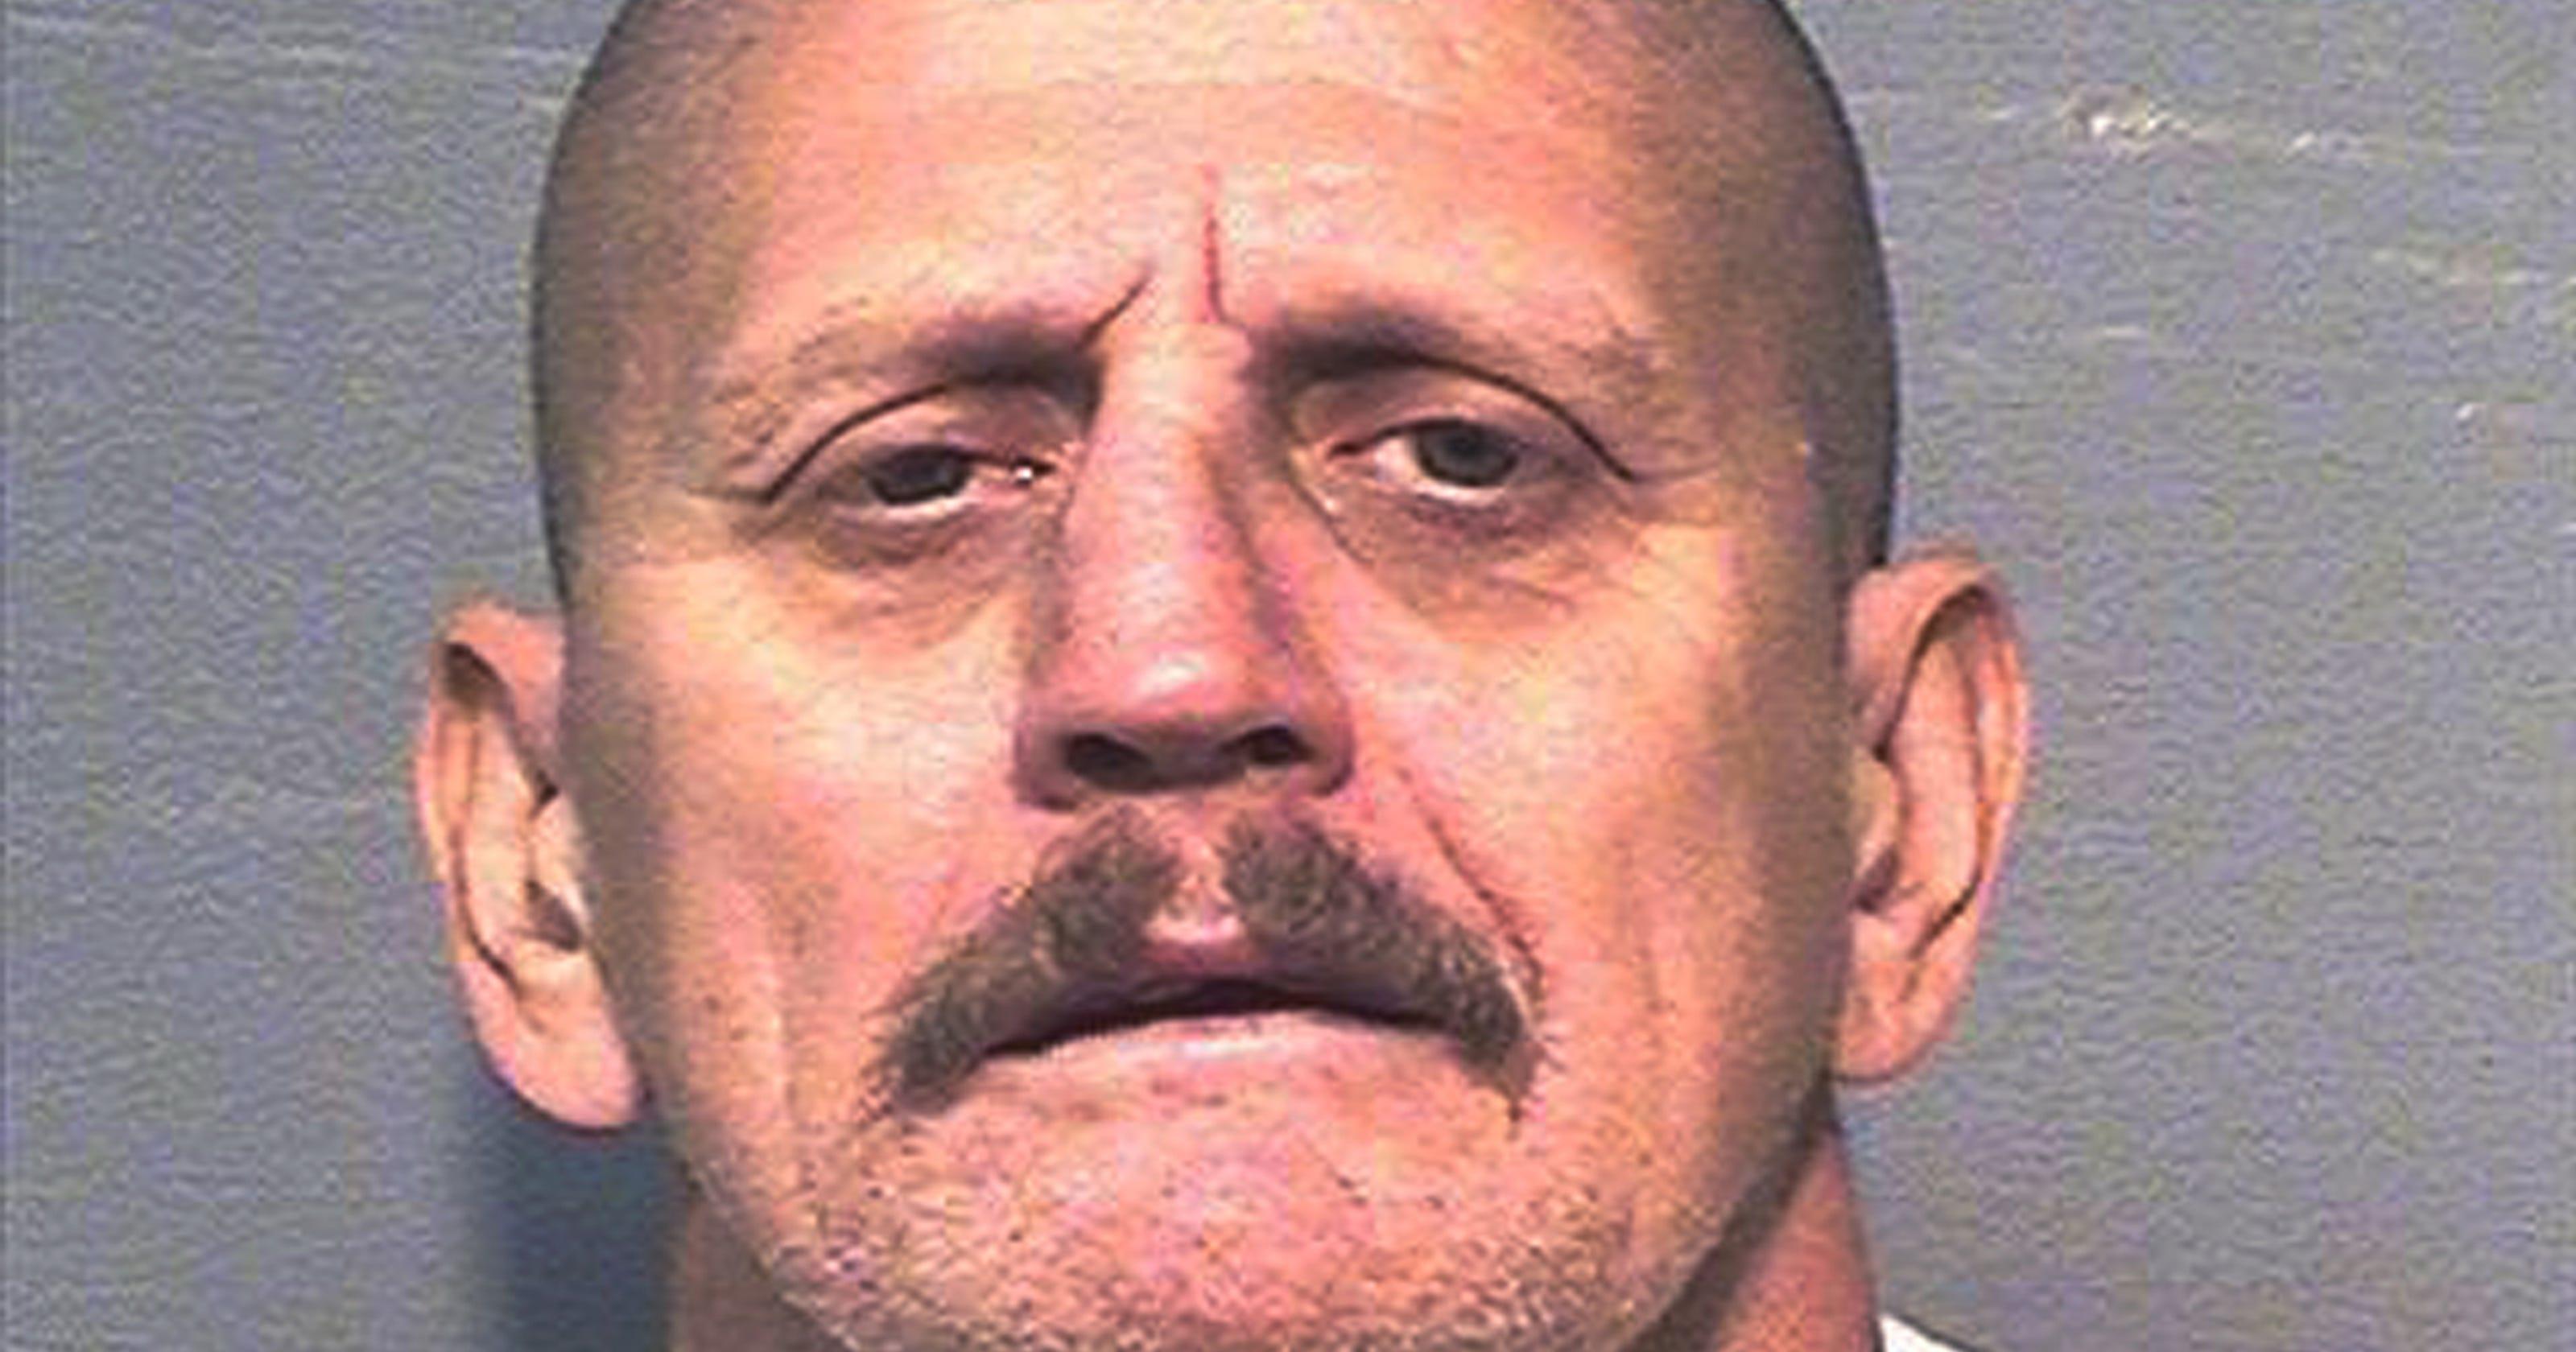 Prisoner slain in California was white supremacist leader